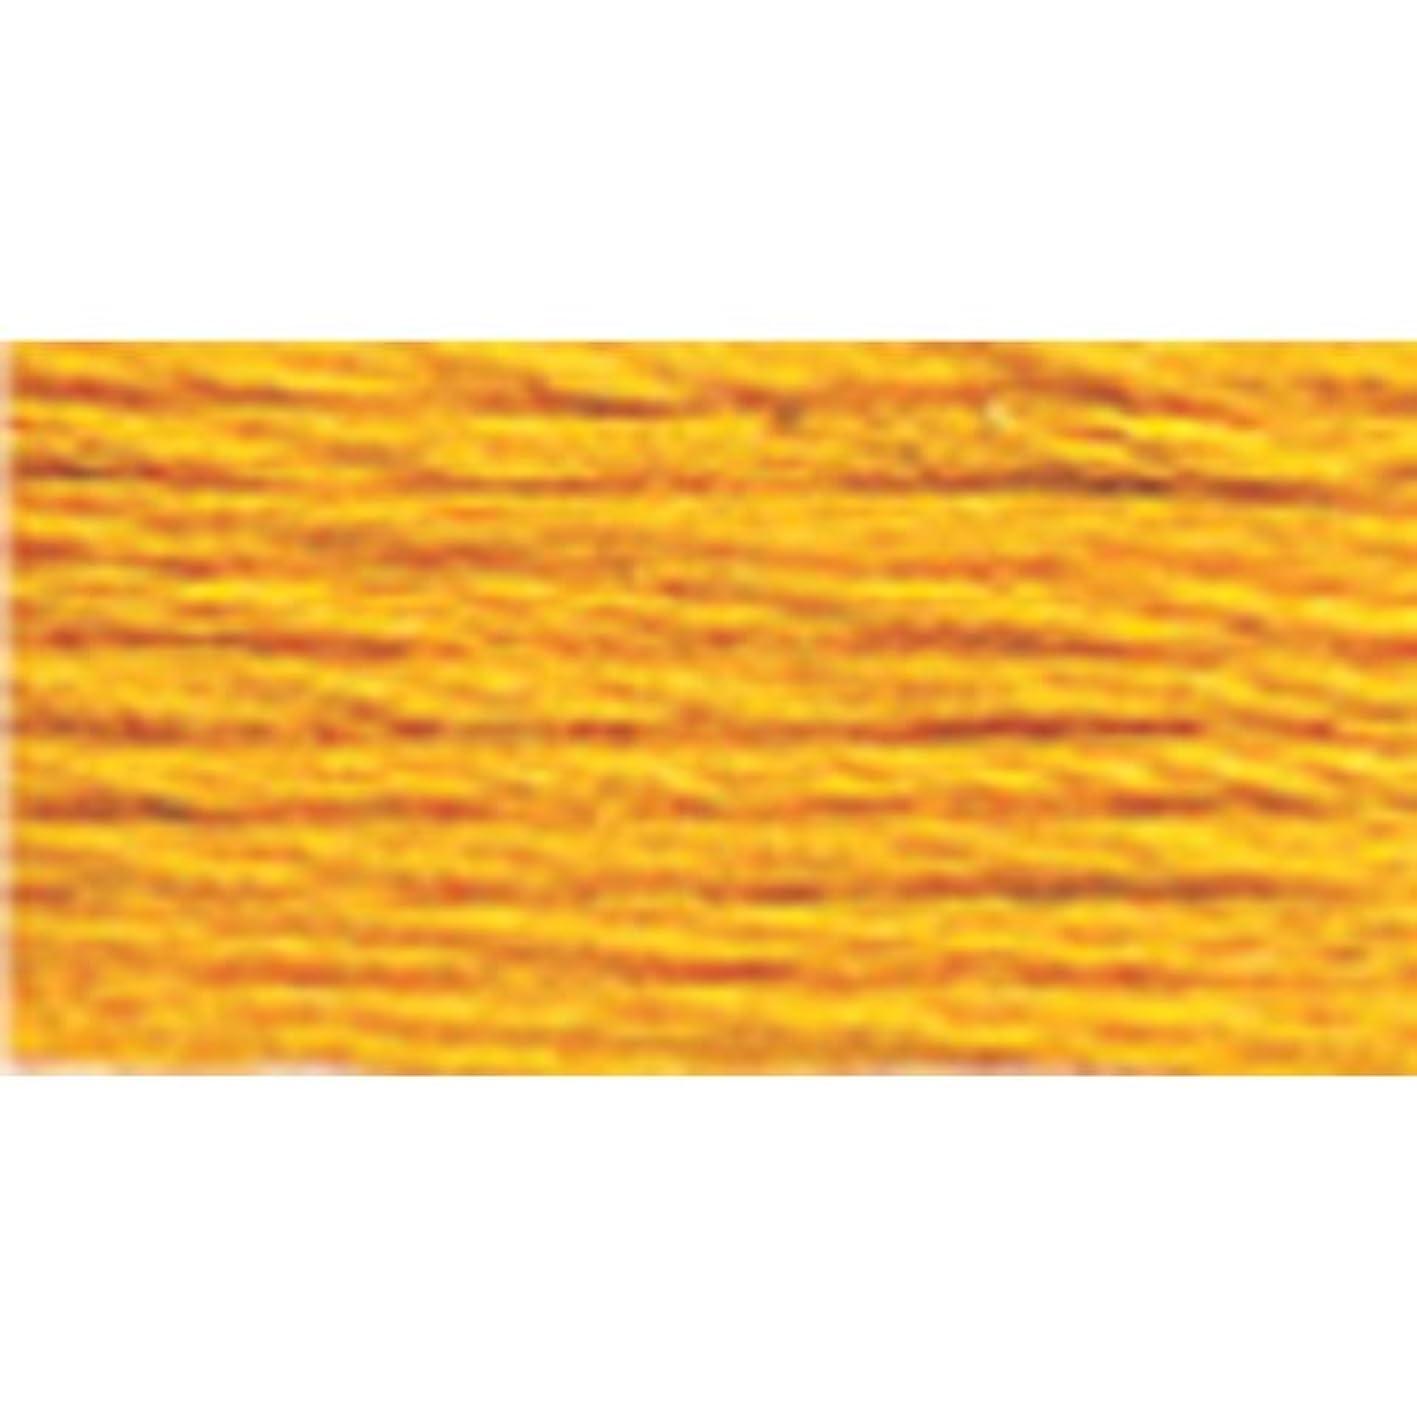 DMC 117-972 6 Strand Embroidery Cotton Floss, Deep Canary, 8.7-Yard cgqujvkaium513